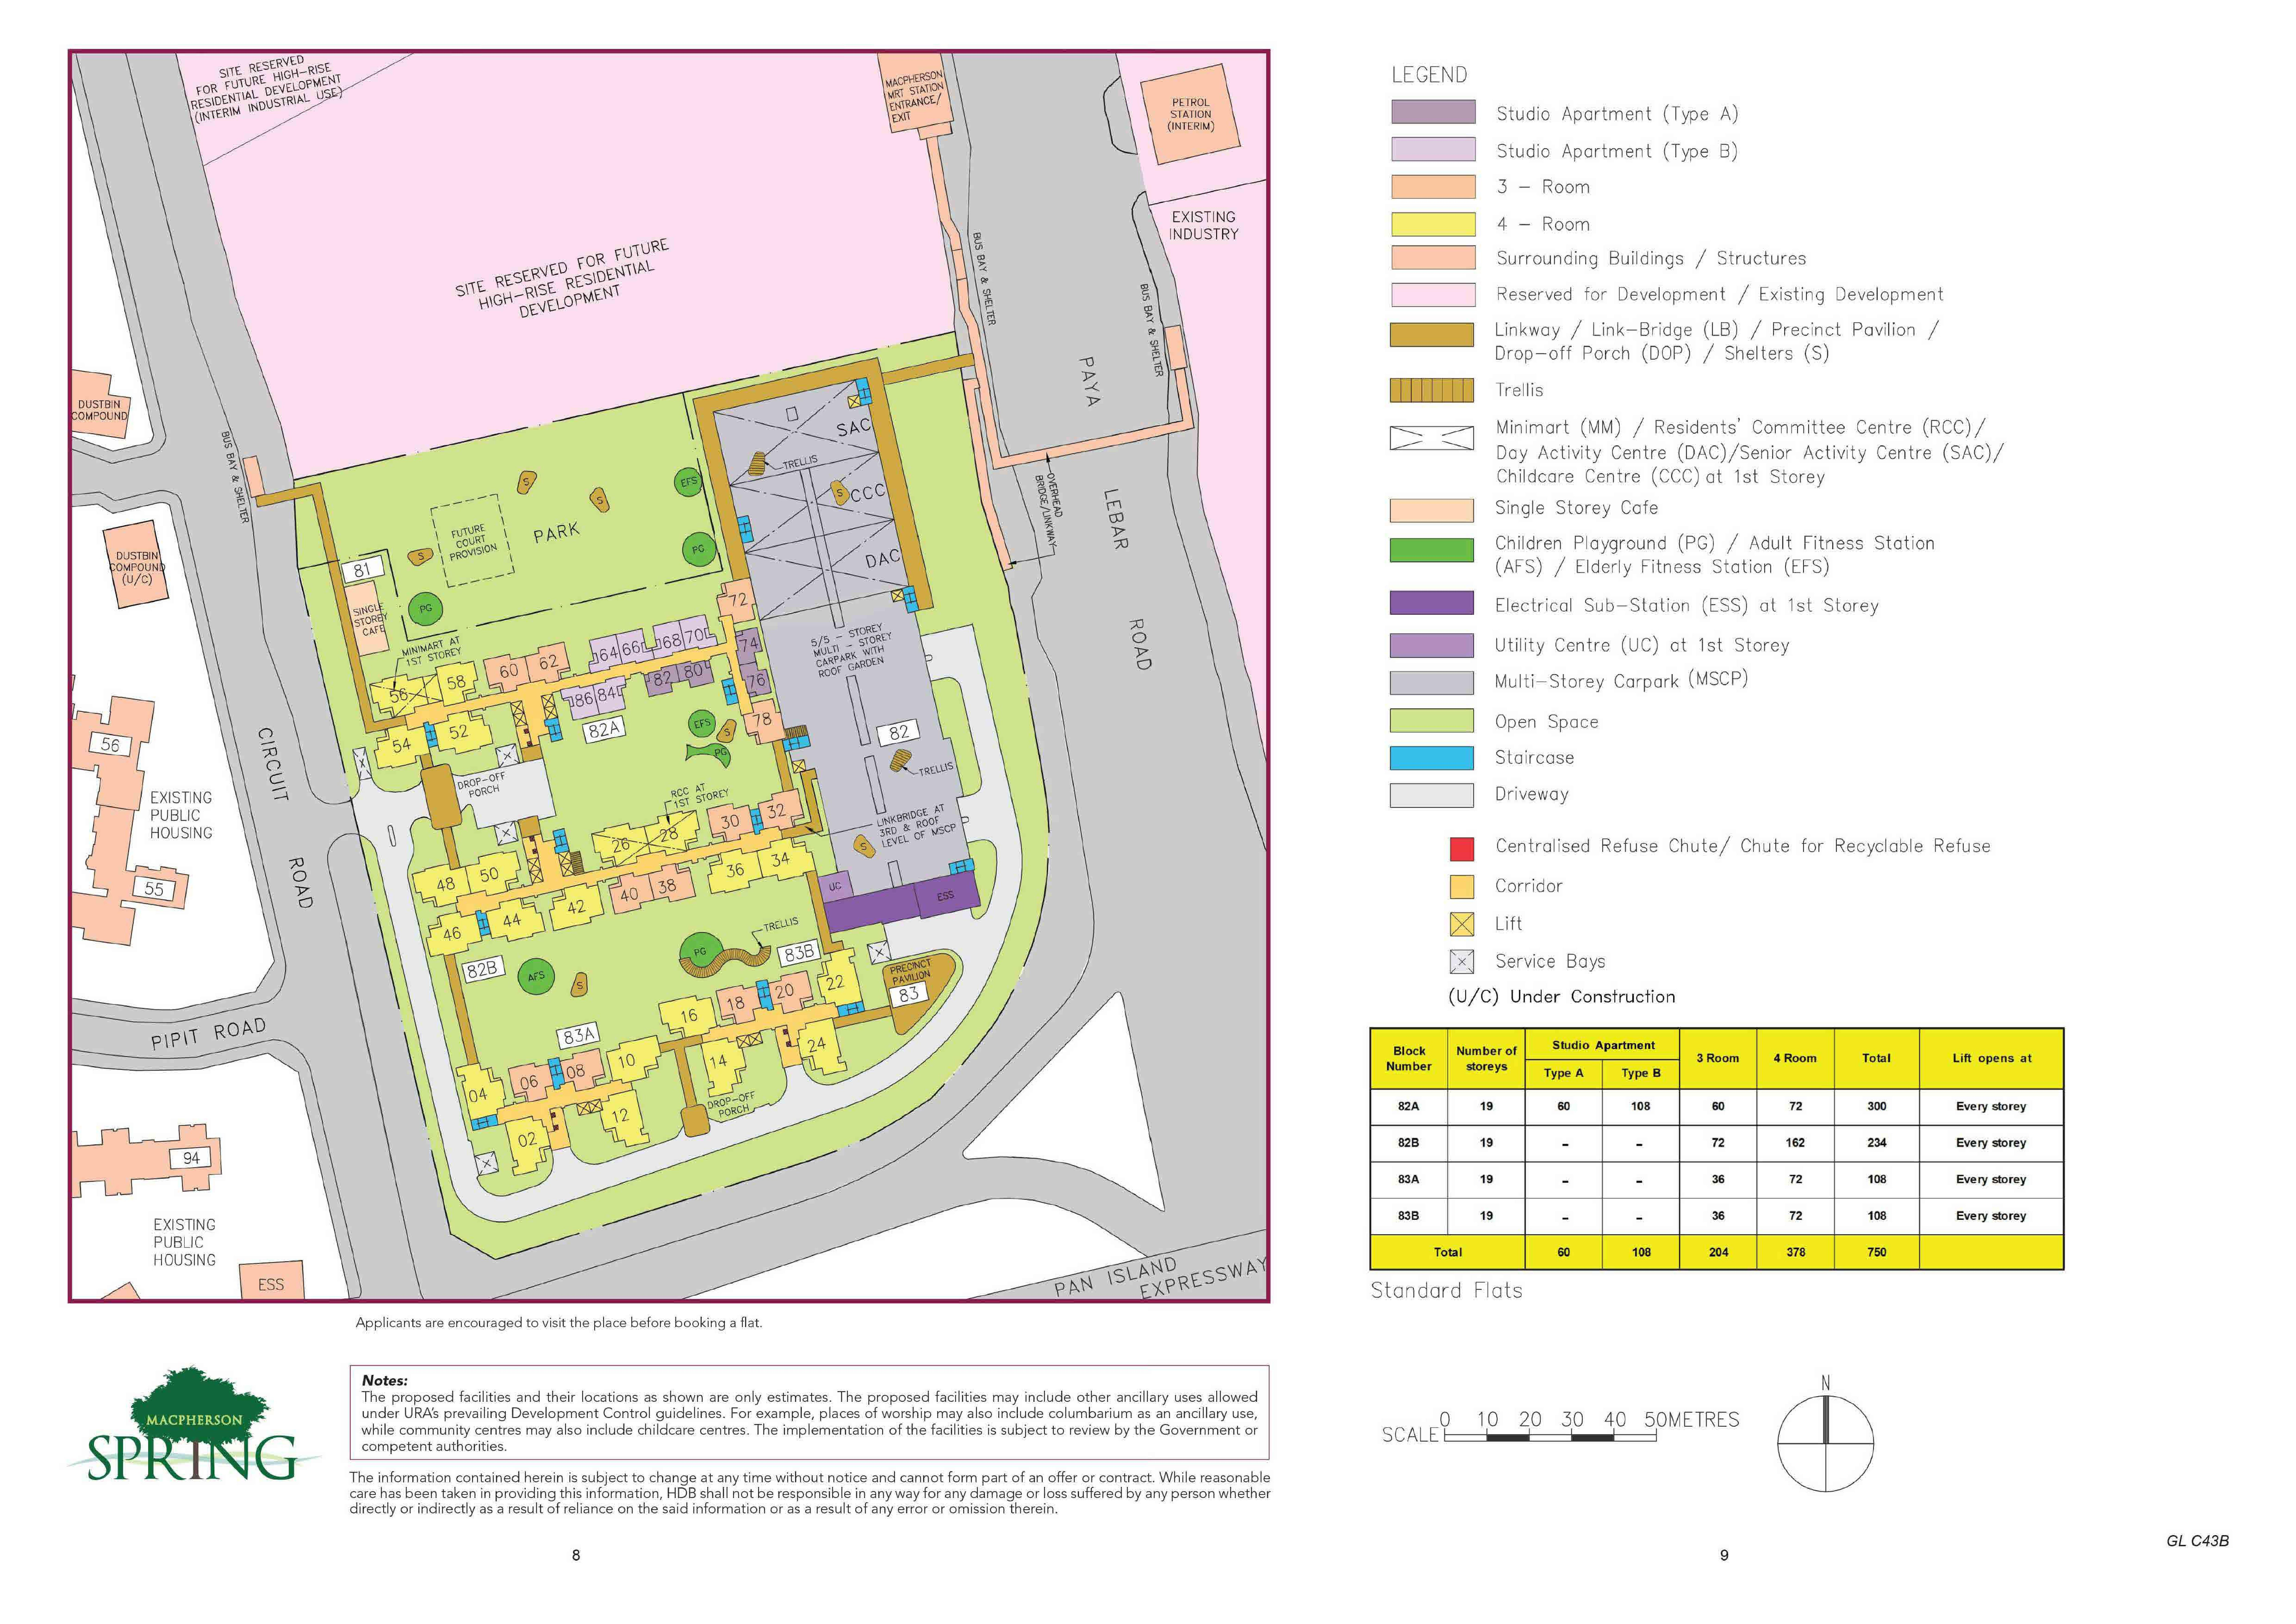 Macpherson Spring Site Plan